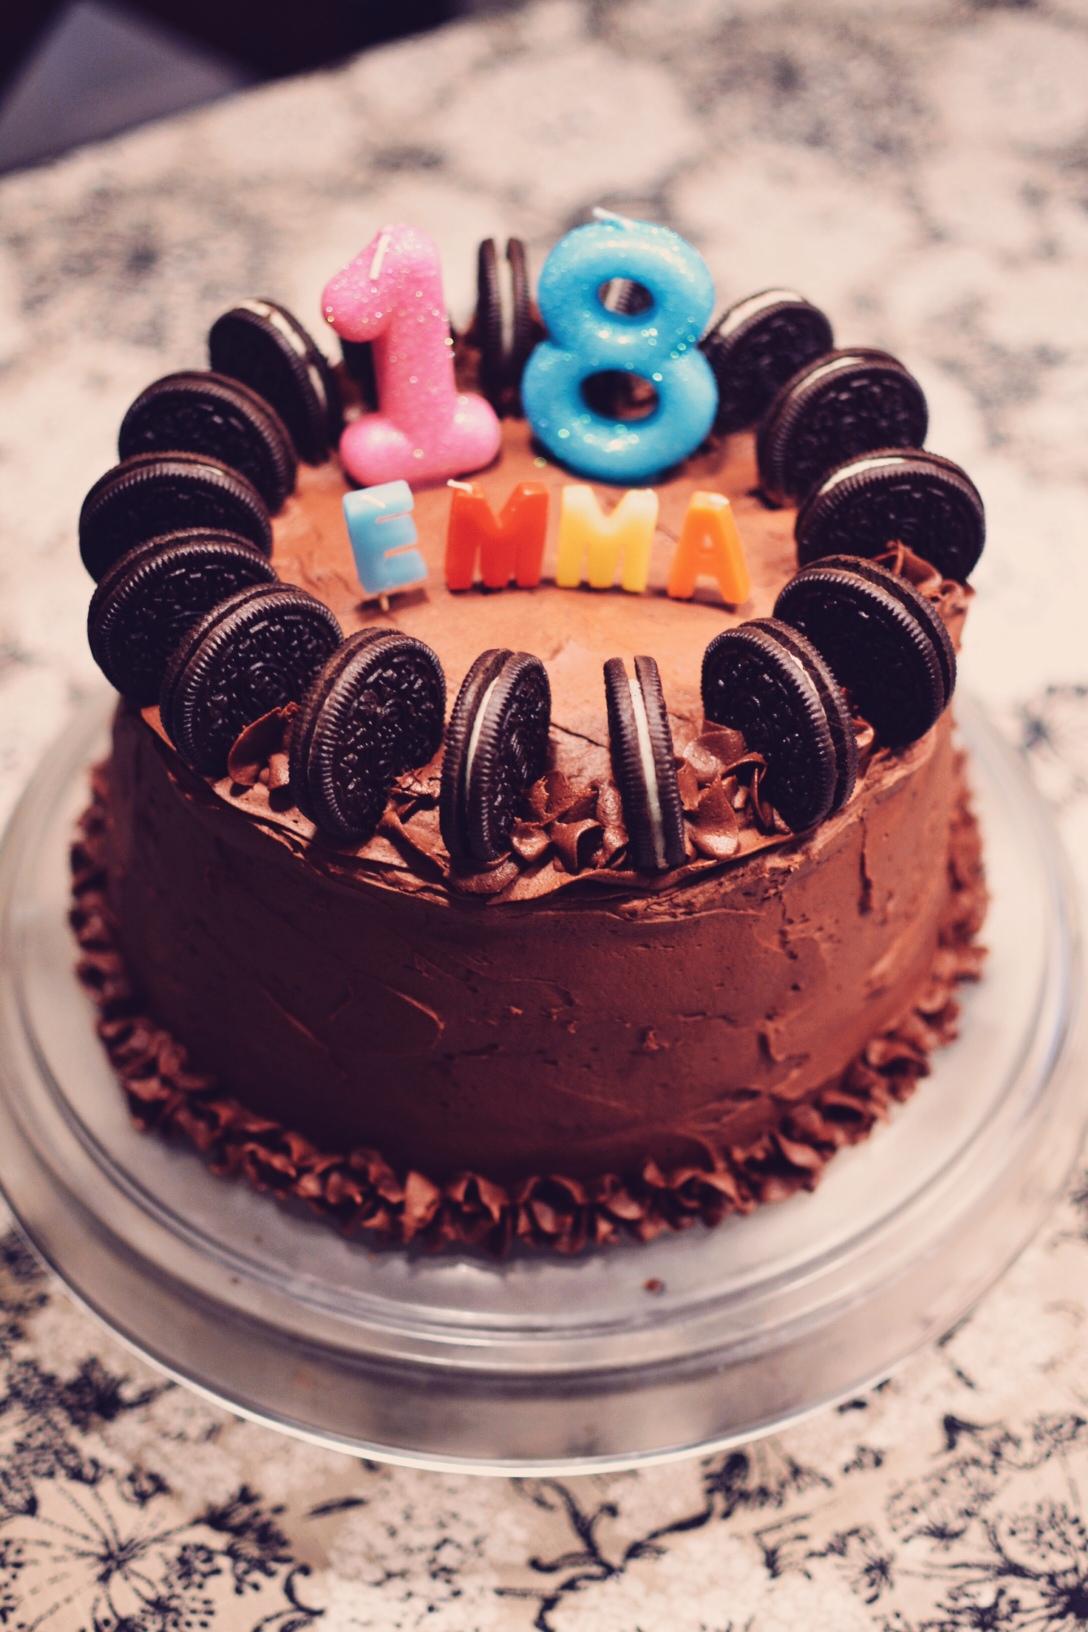 My 18th Birthday Cake Crumbs And Tea